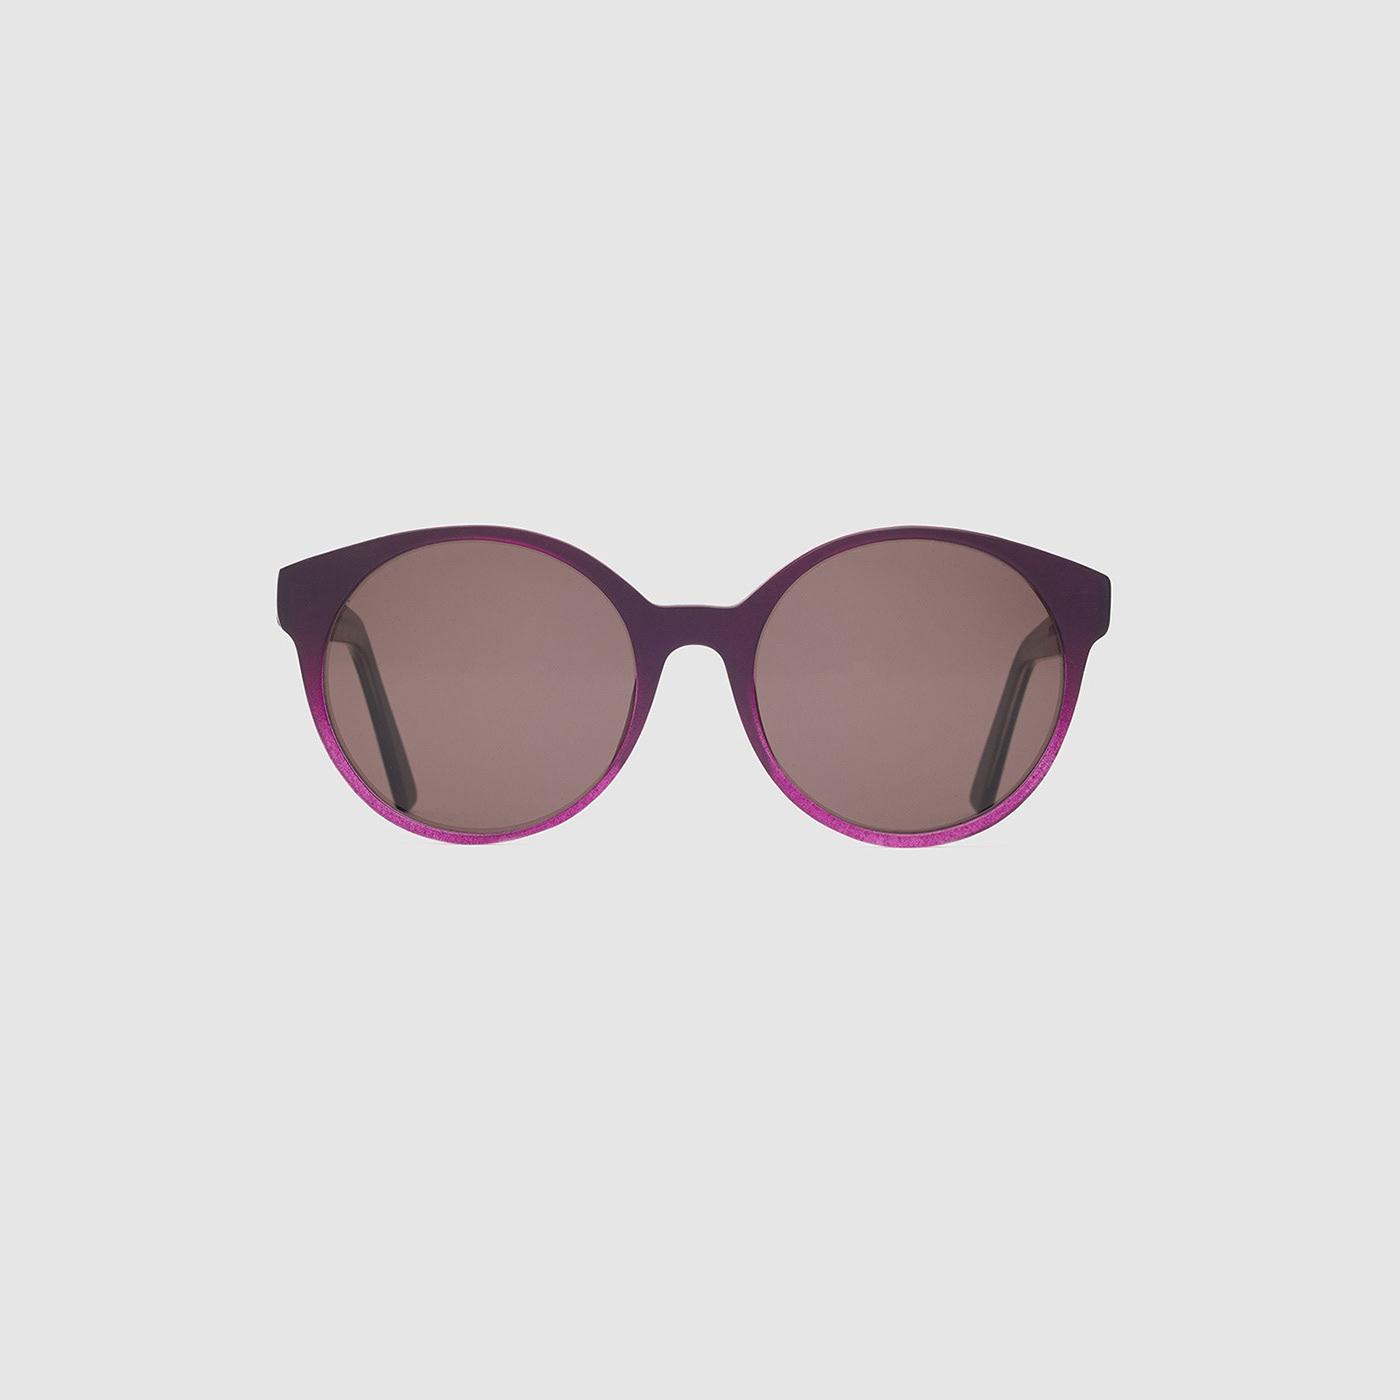 eyewear inhotim eyeglasses gradient botanical Fashion  Sunglasses